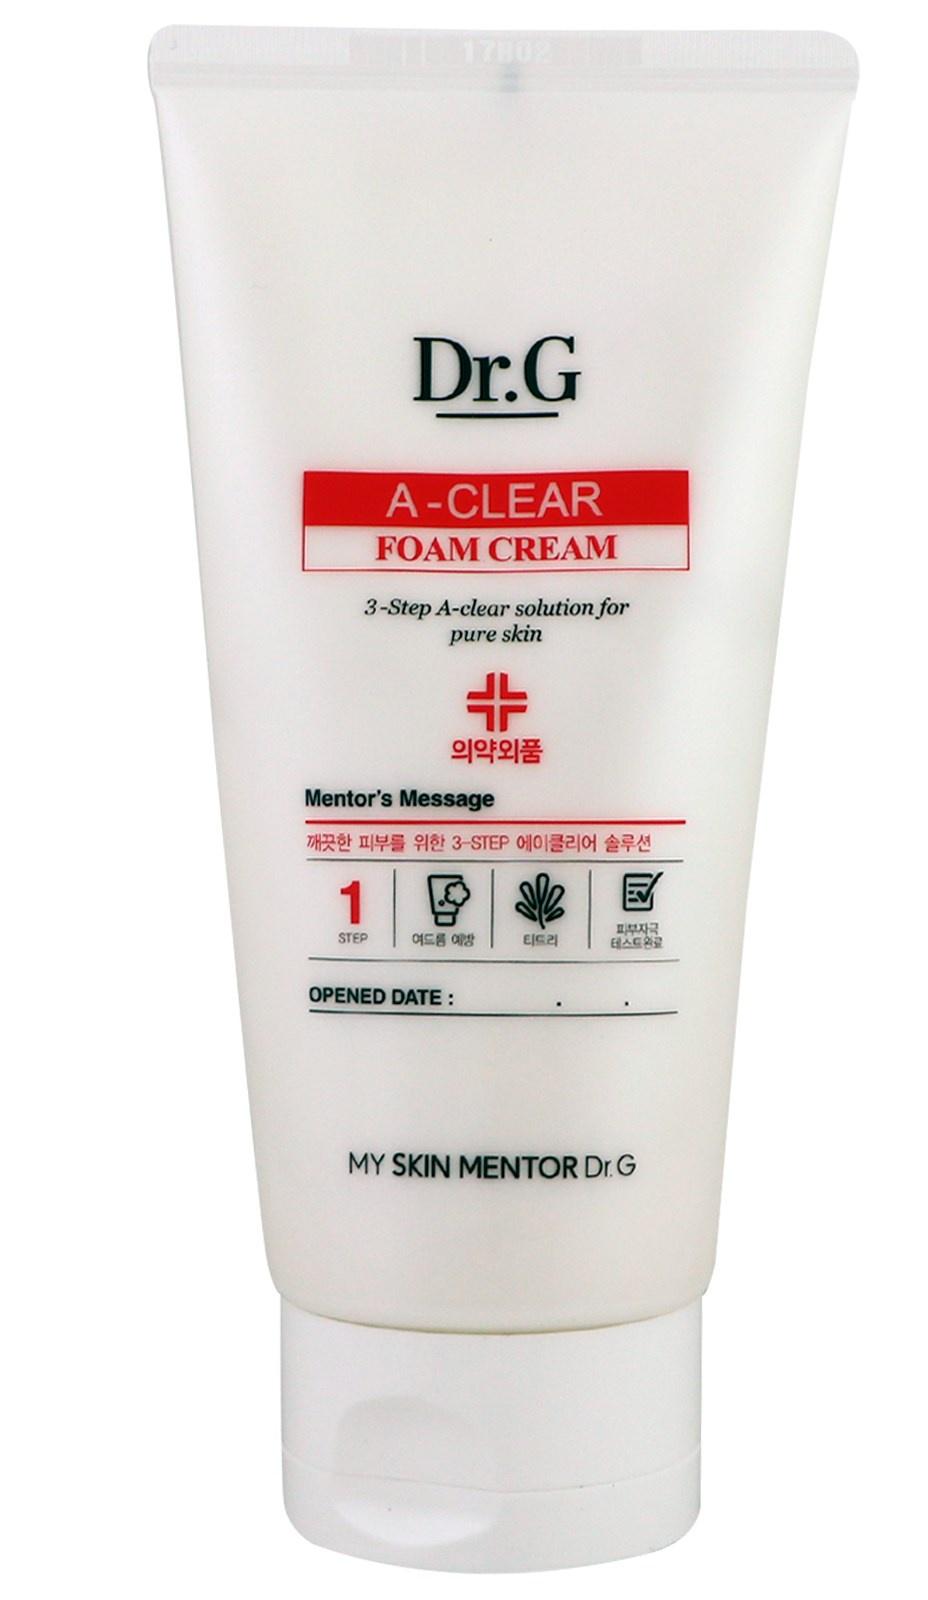 Dr. G A-Clear Foam Cream